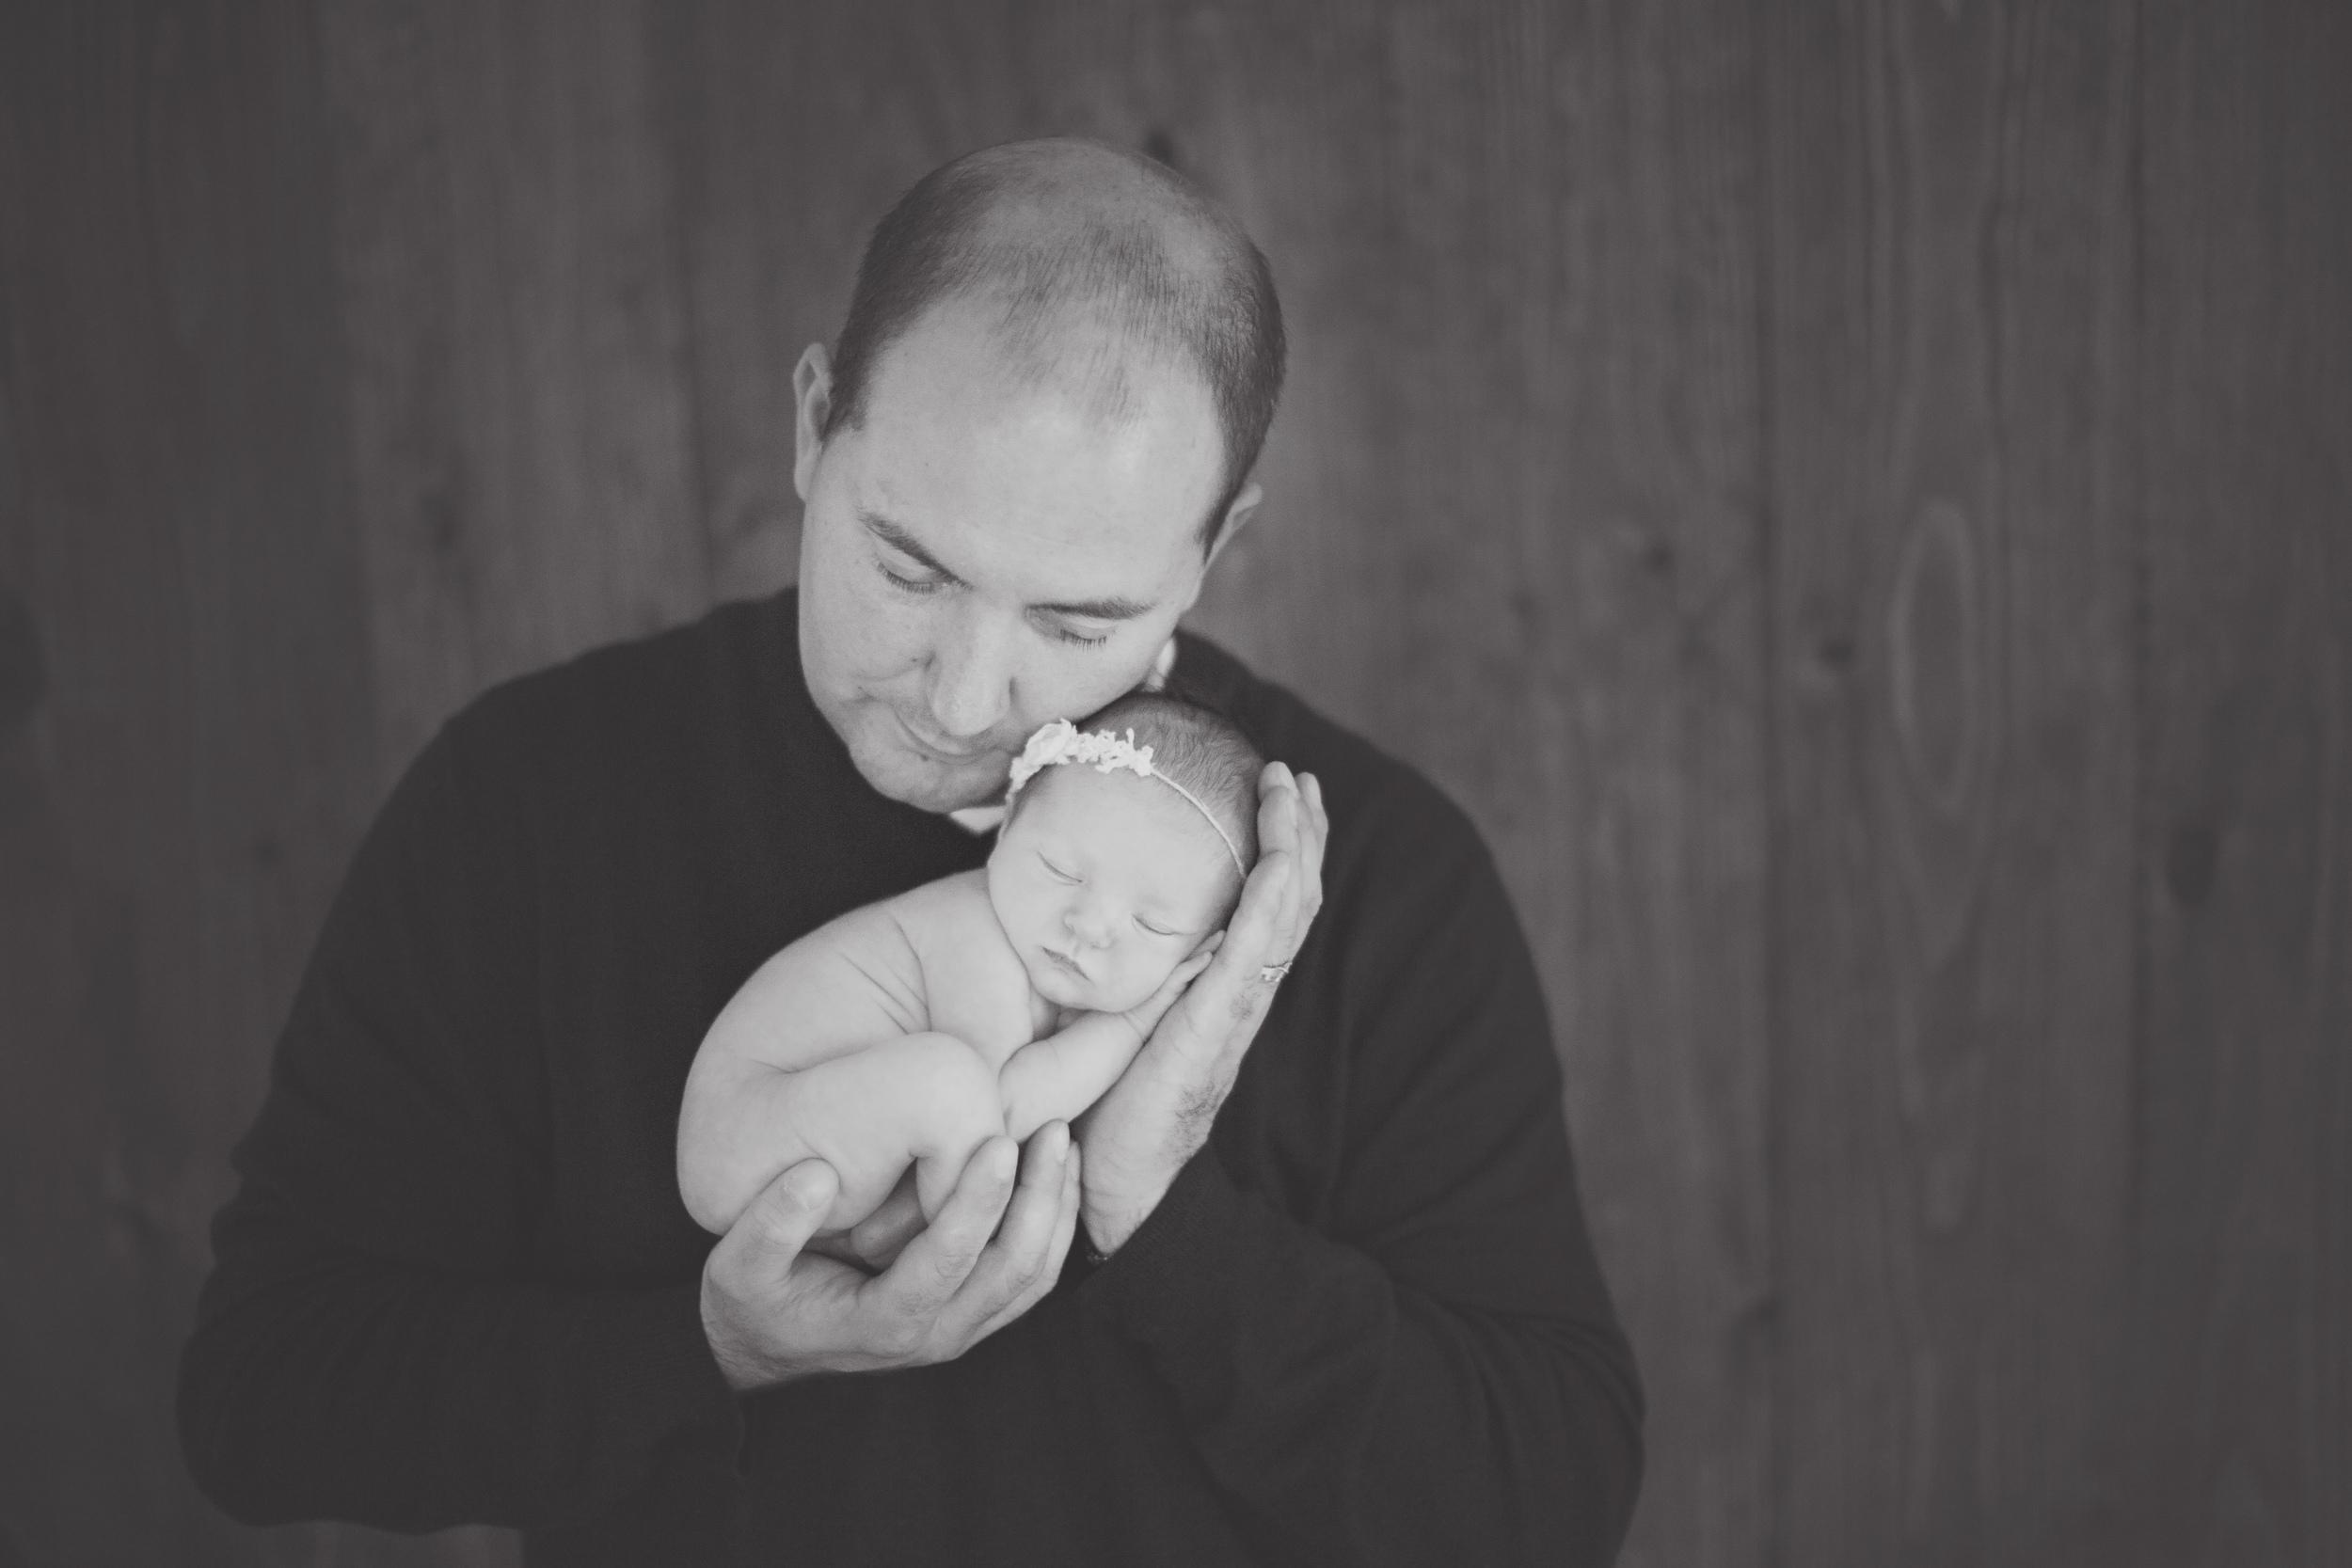 syracuse baby photographer